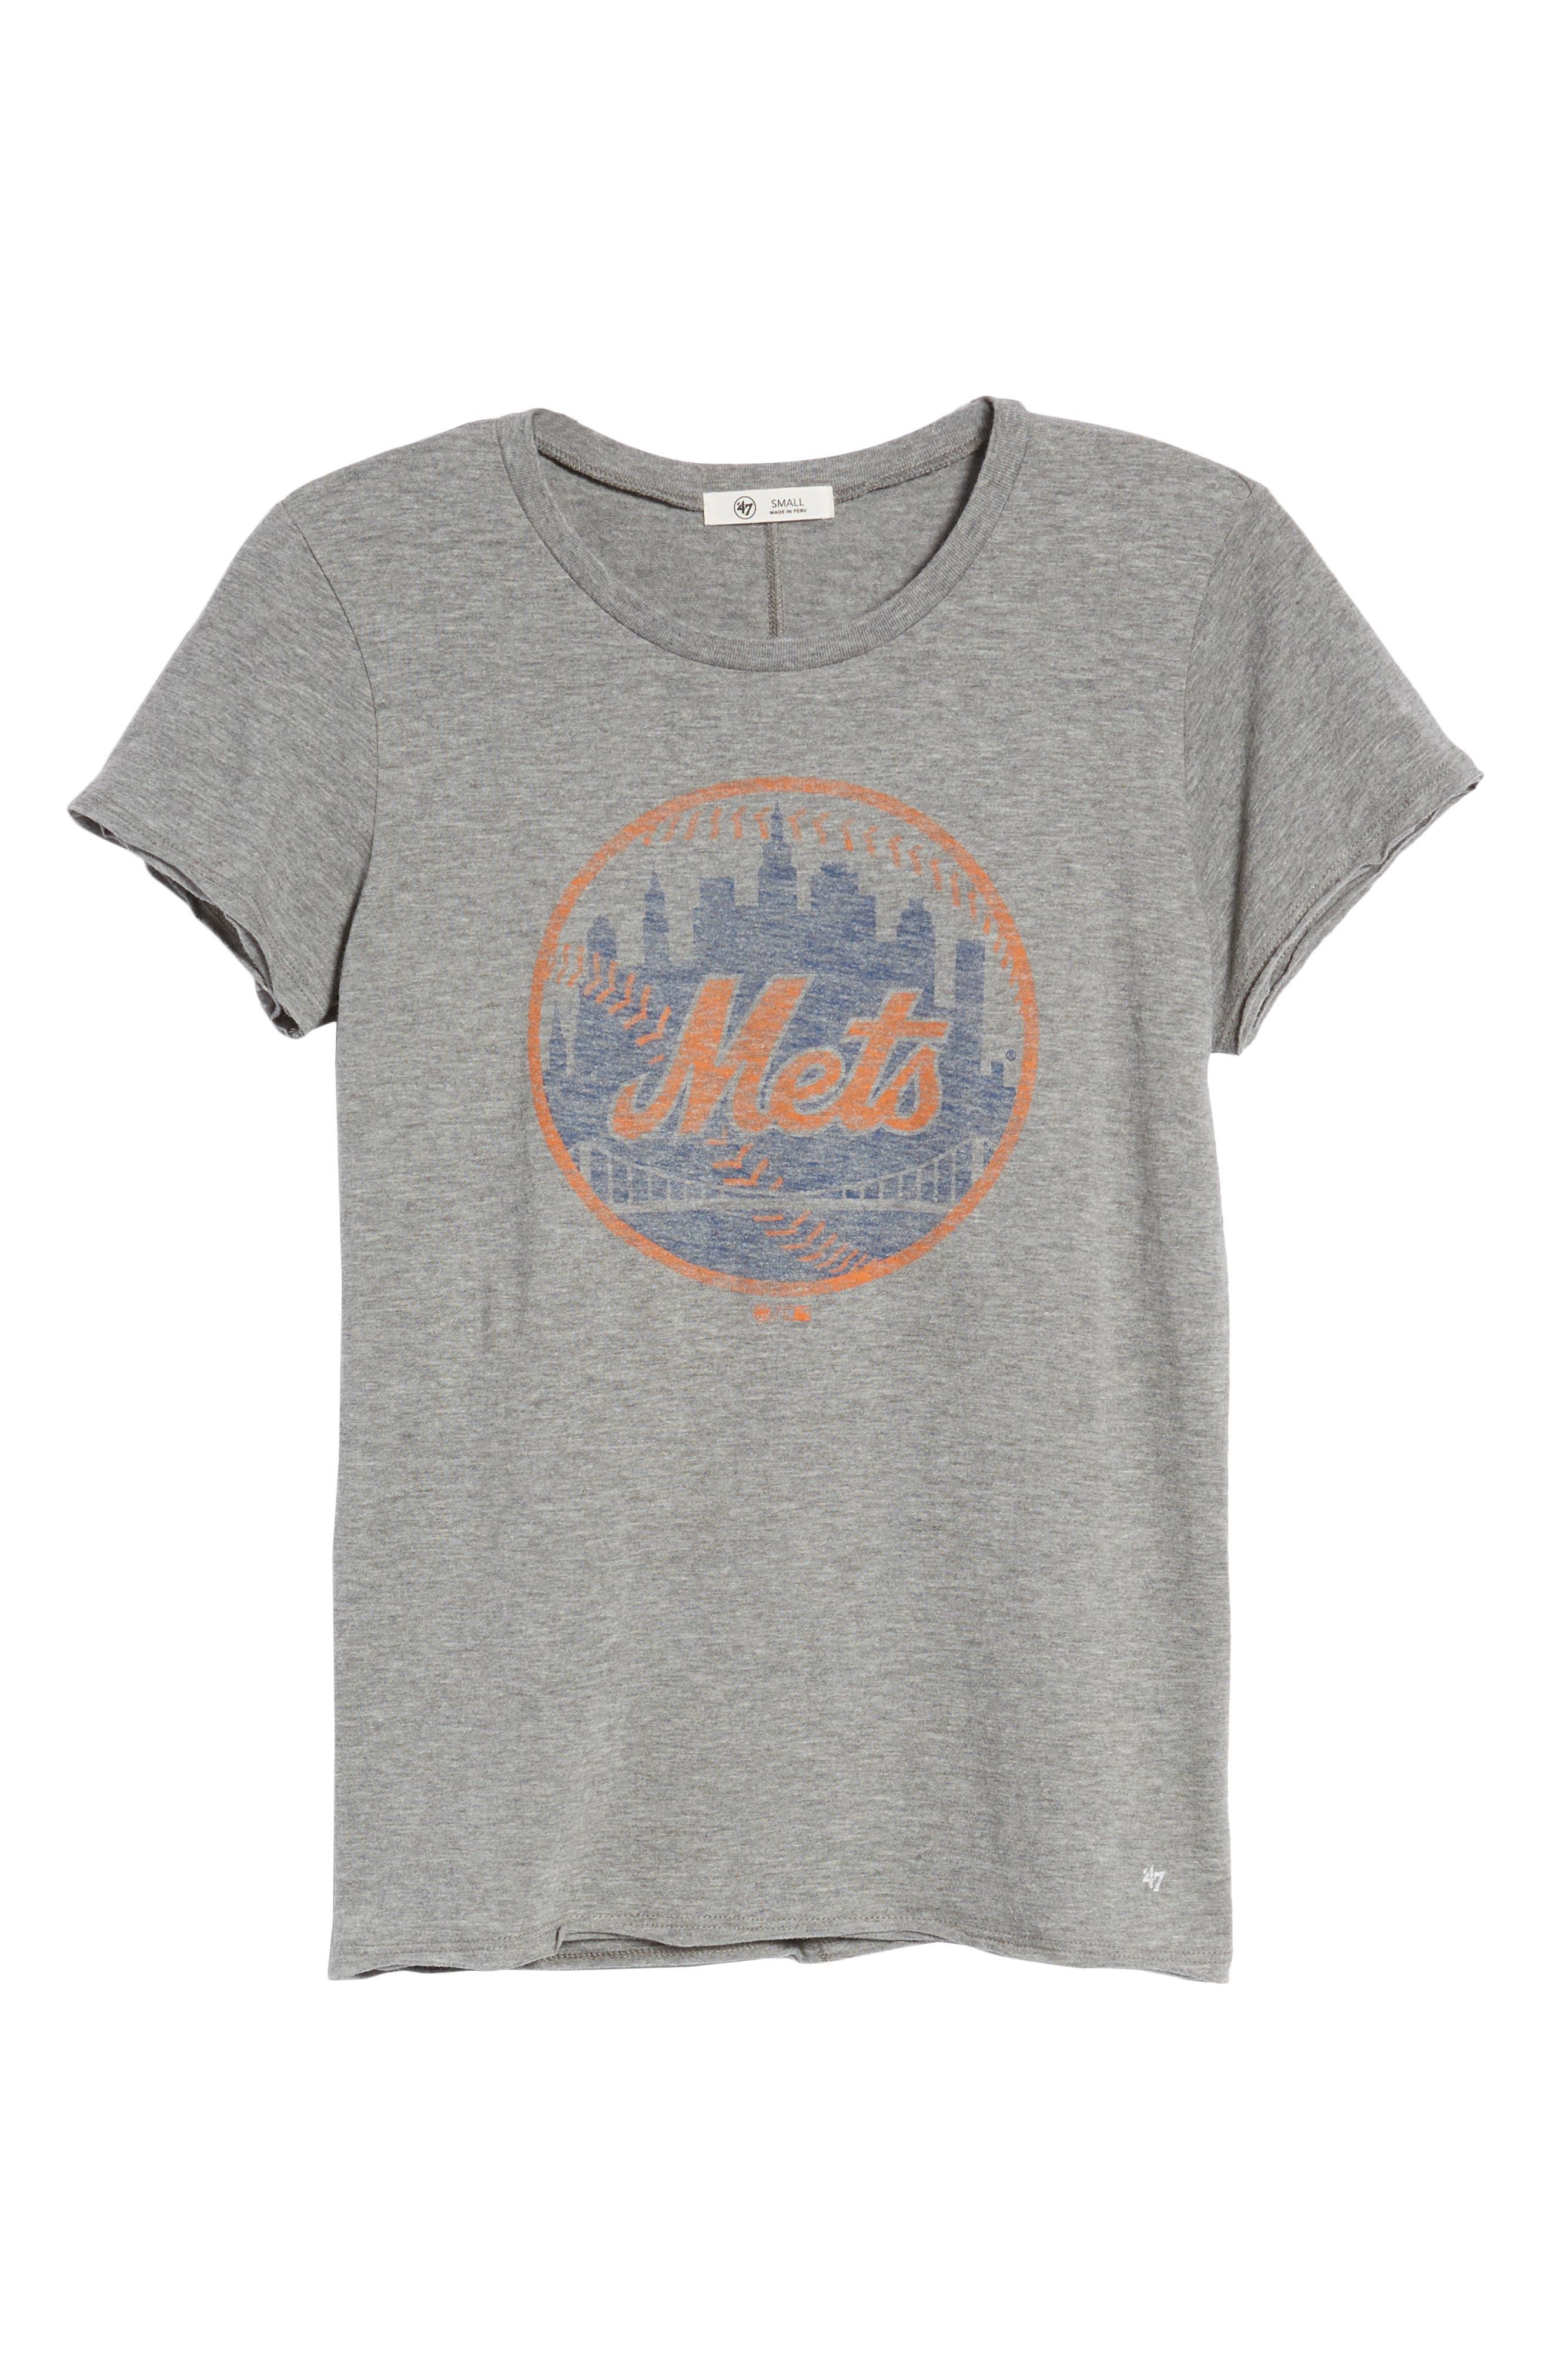 New York Mets Fader Letter Tee,                             Alternate thumbnail 6, color,                             021